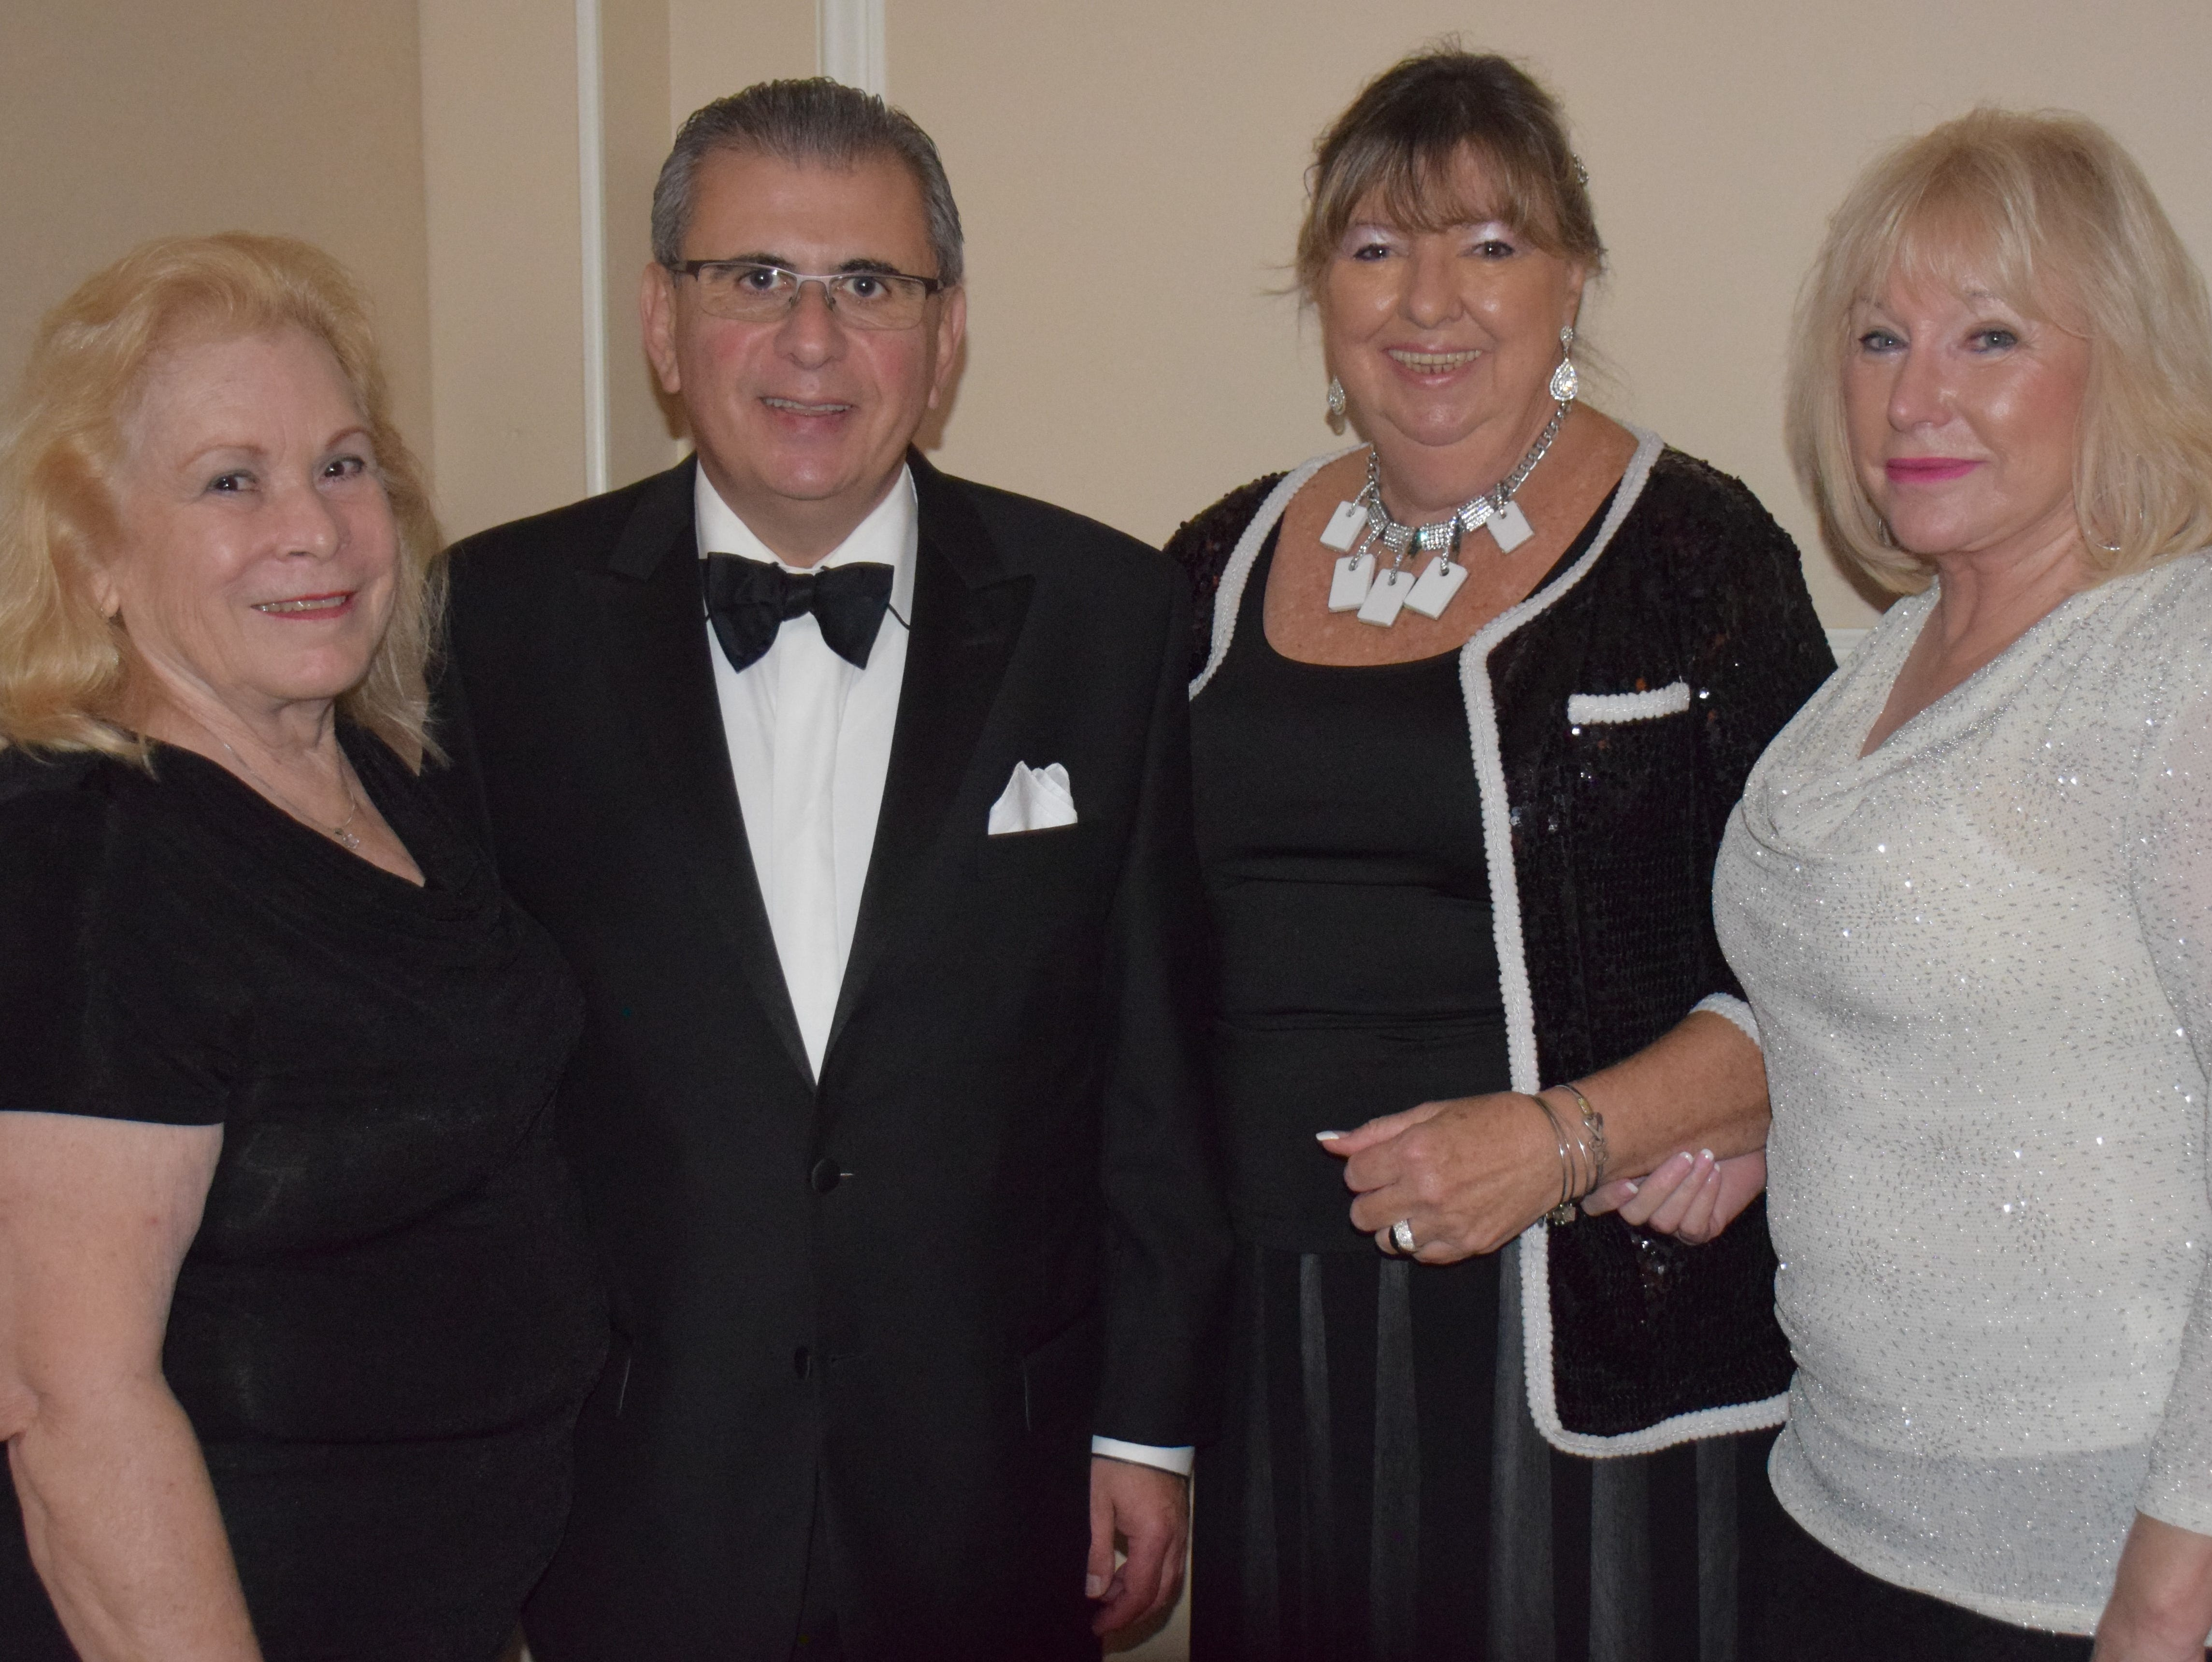 Sponsors Judy Landgrave, Sam Nerves, Pat Stelz and Connie Bishop